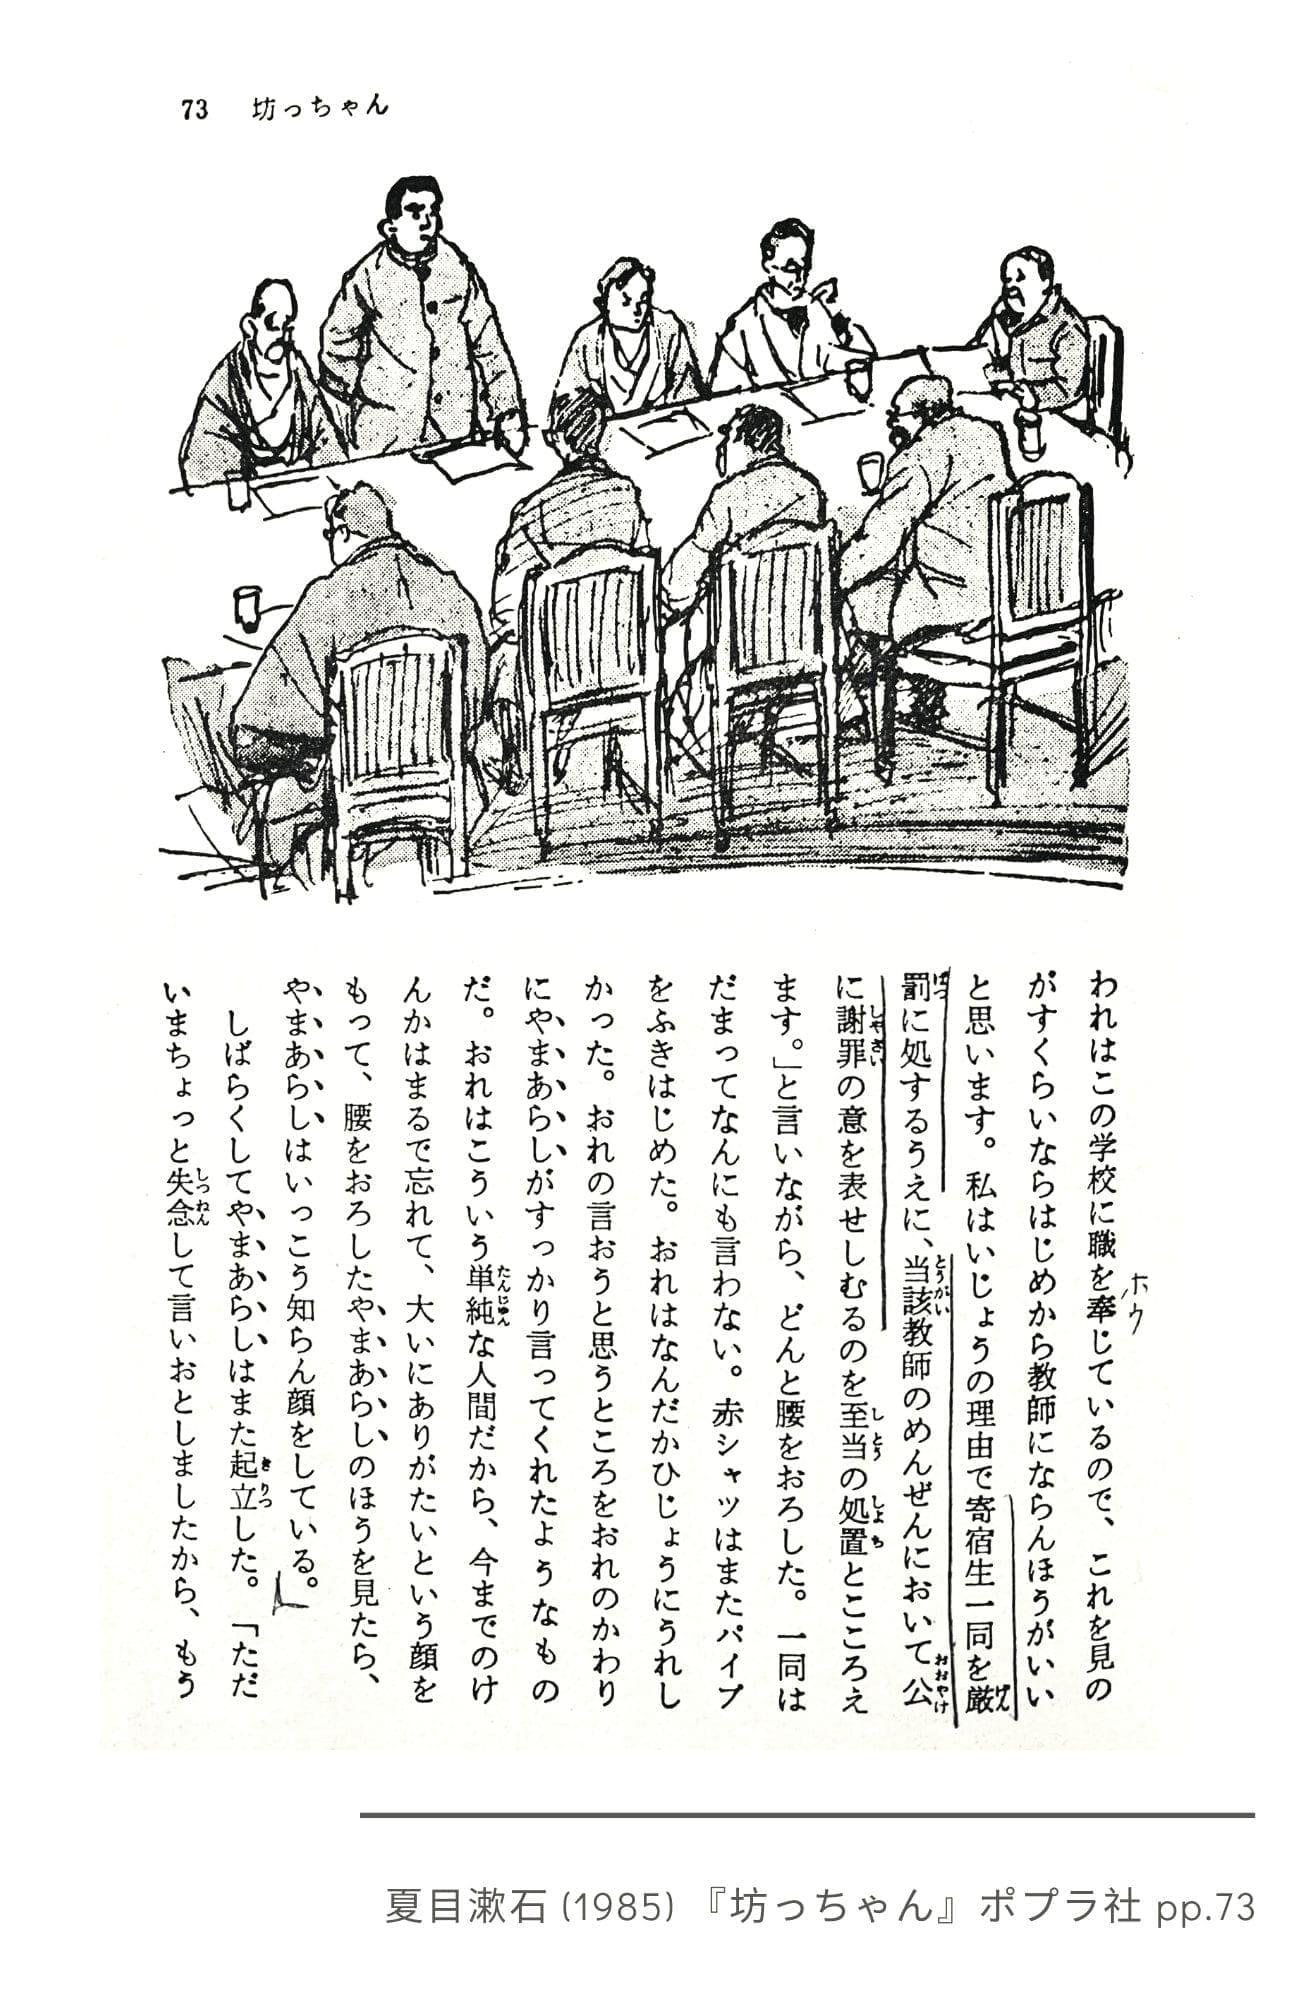 Botchan, The Meeting, pp.73